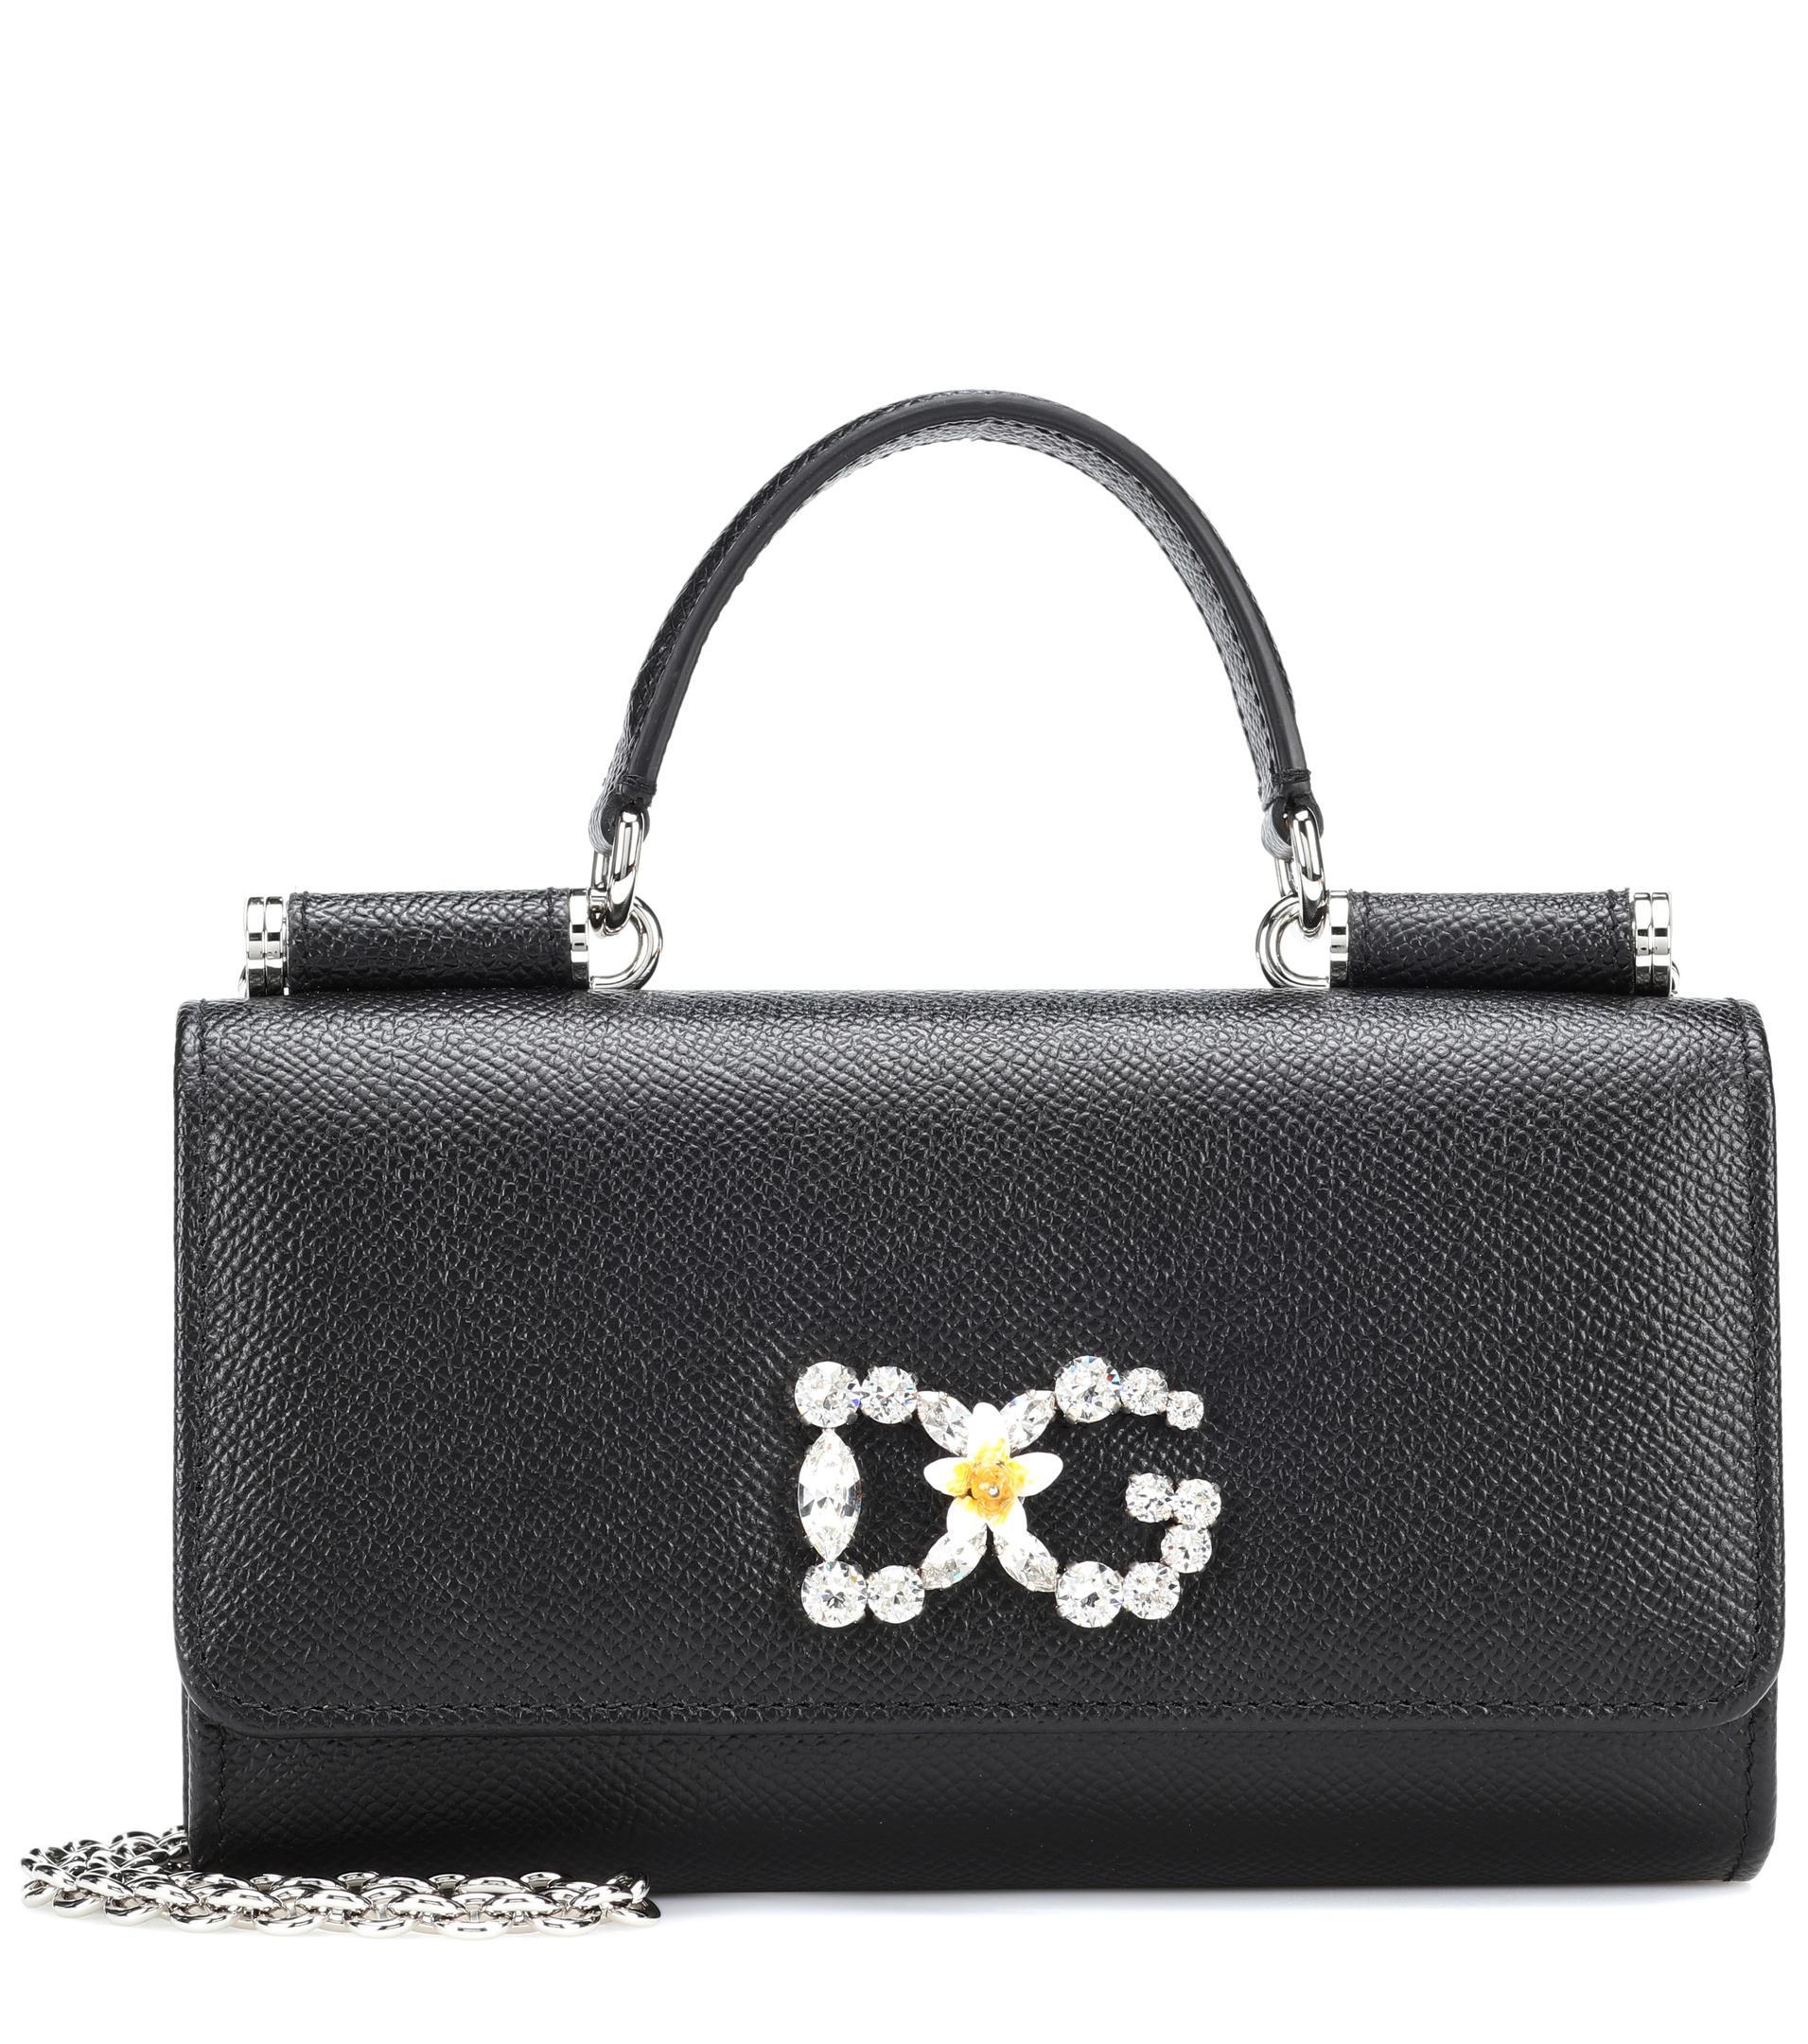 Sac Sicily Lyst Gabbana Ornements Dolceamp; Bandoulière À En Cuir IYeHWED29